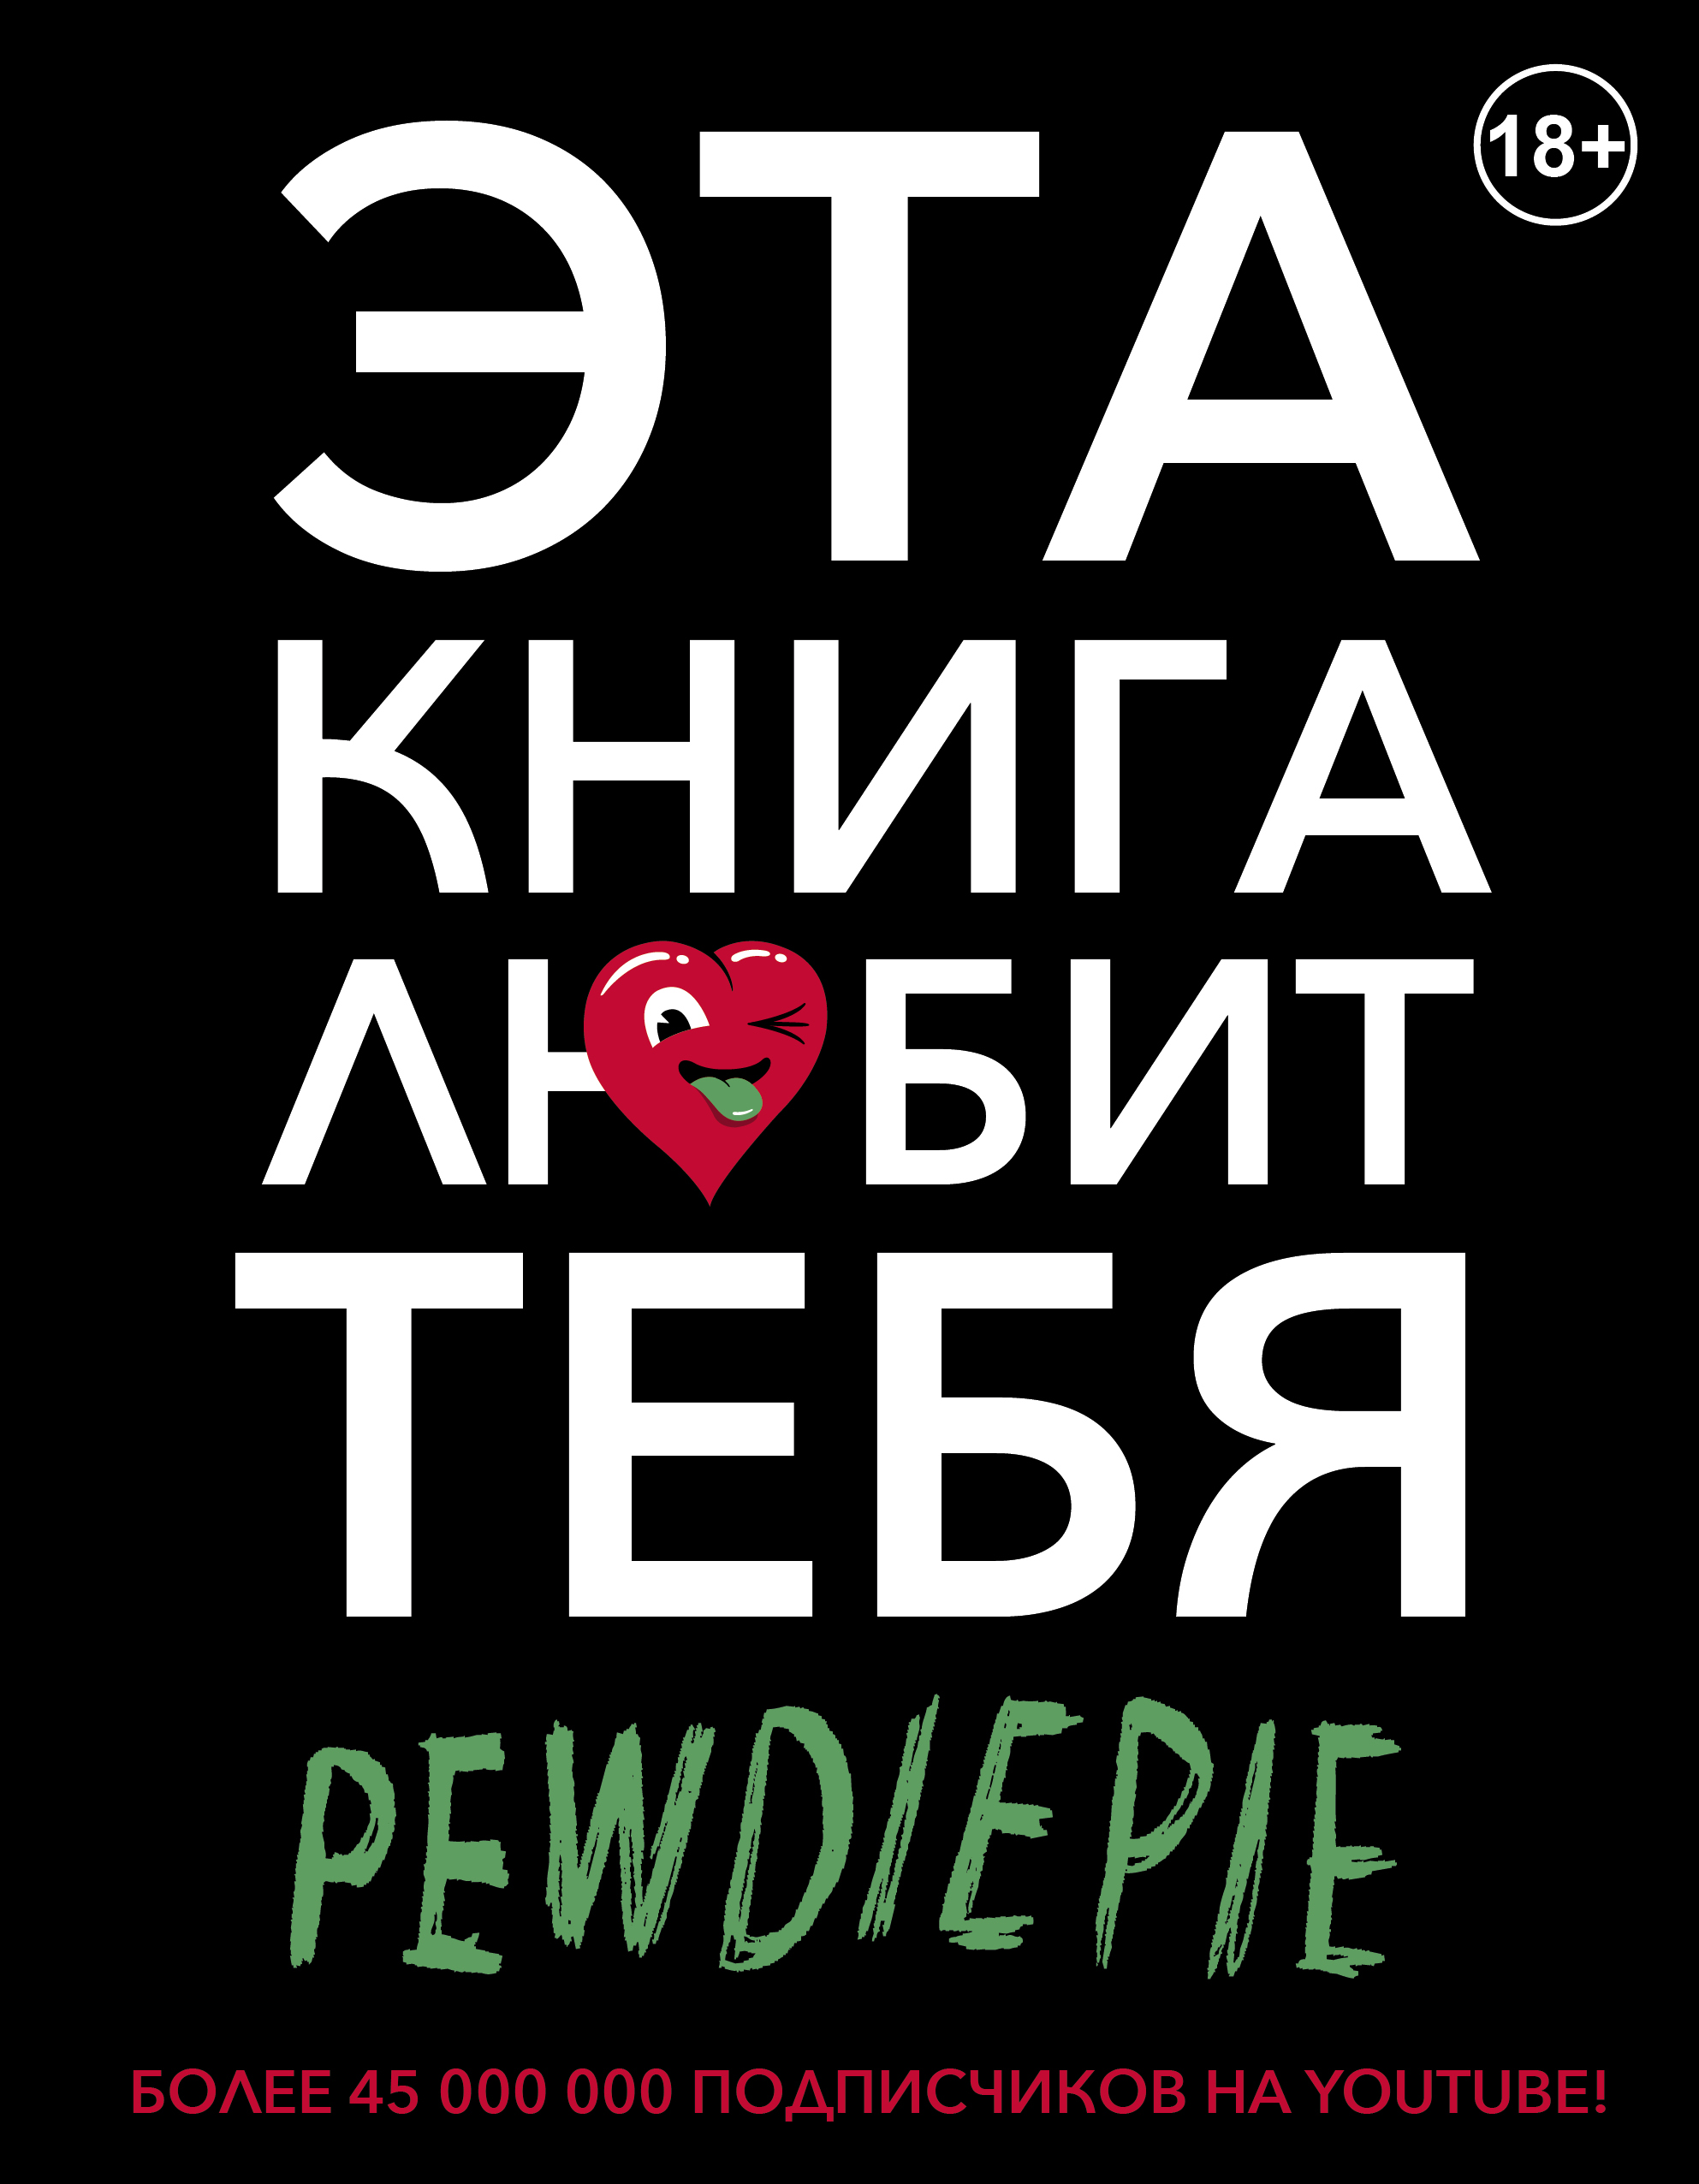 Книга Pewdiepie. Эта книга любит тебя. PewDiePie